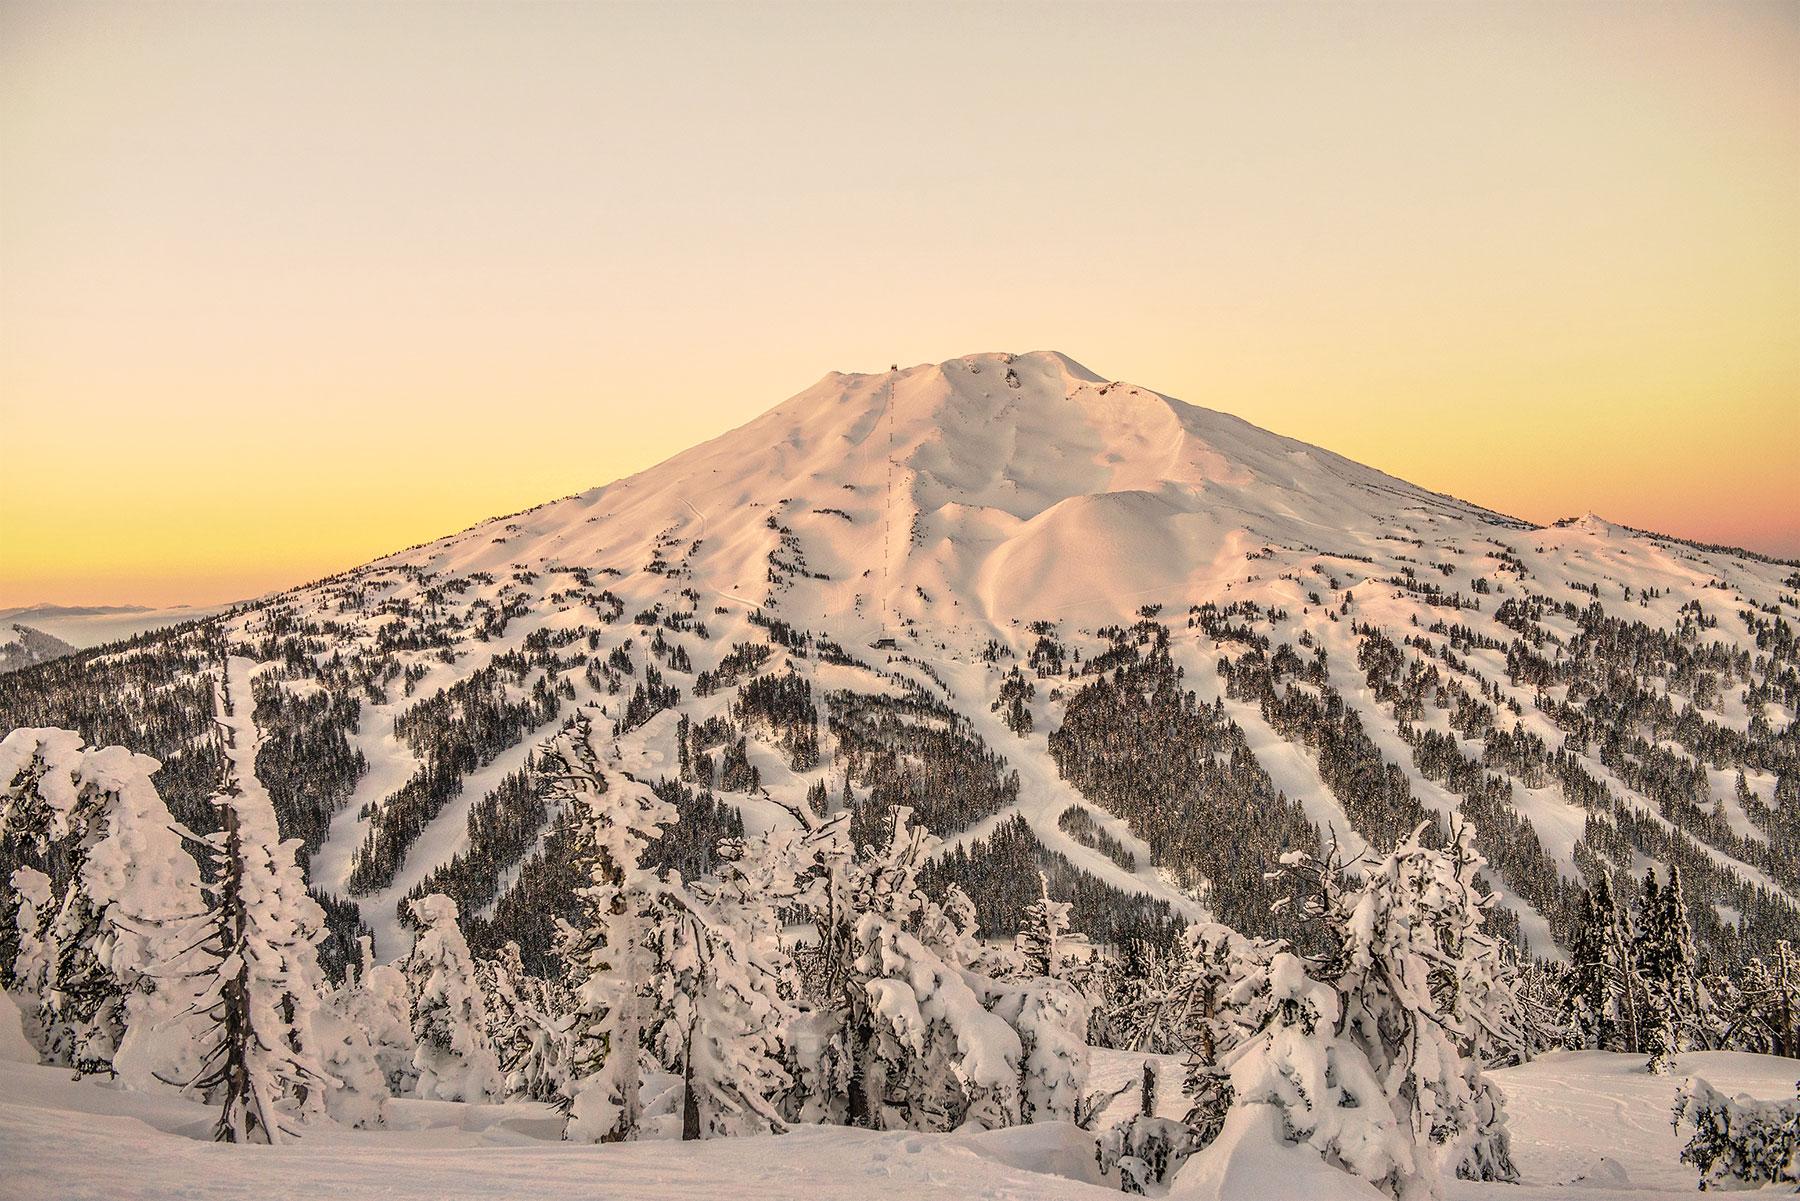 Mt Bachelor Ski Area near Bend Oregon